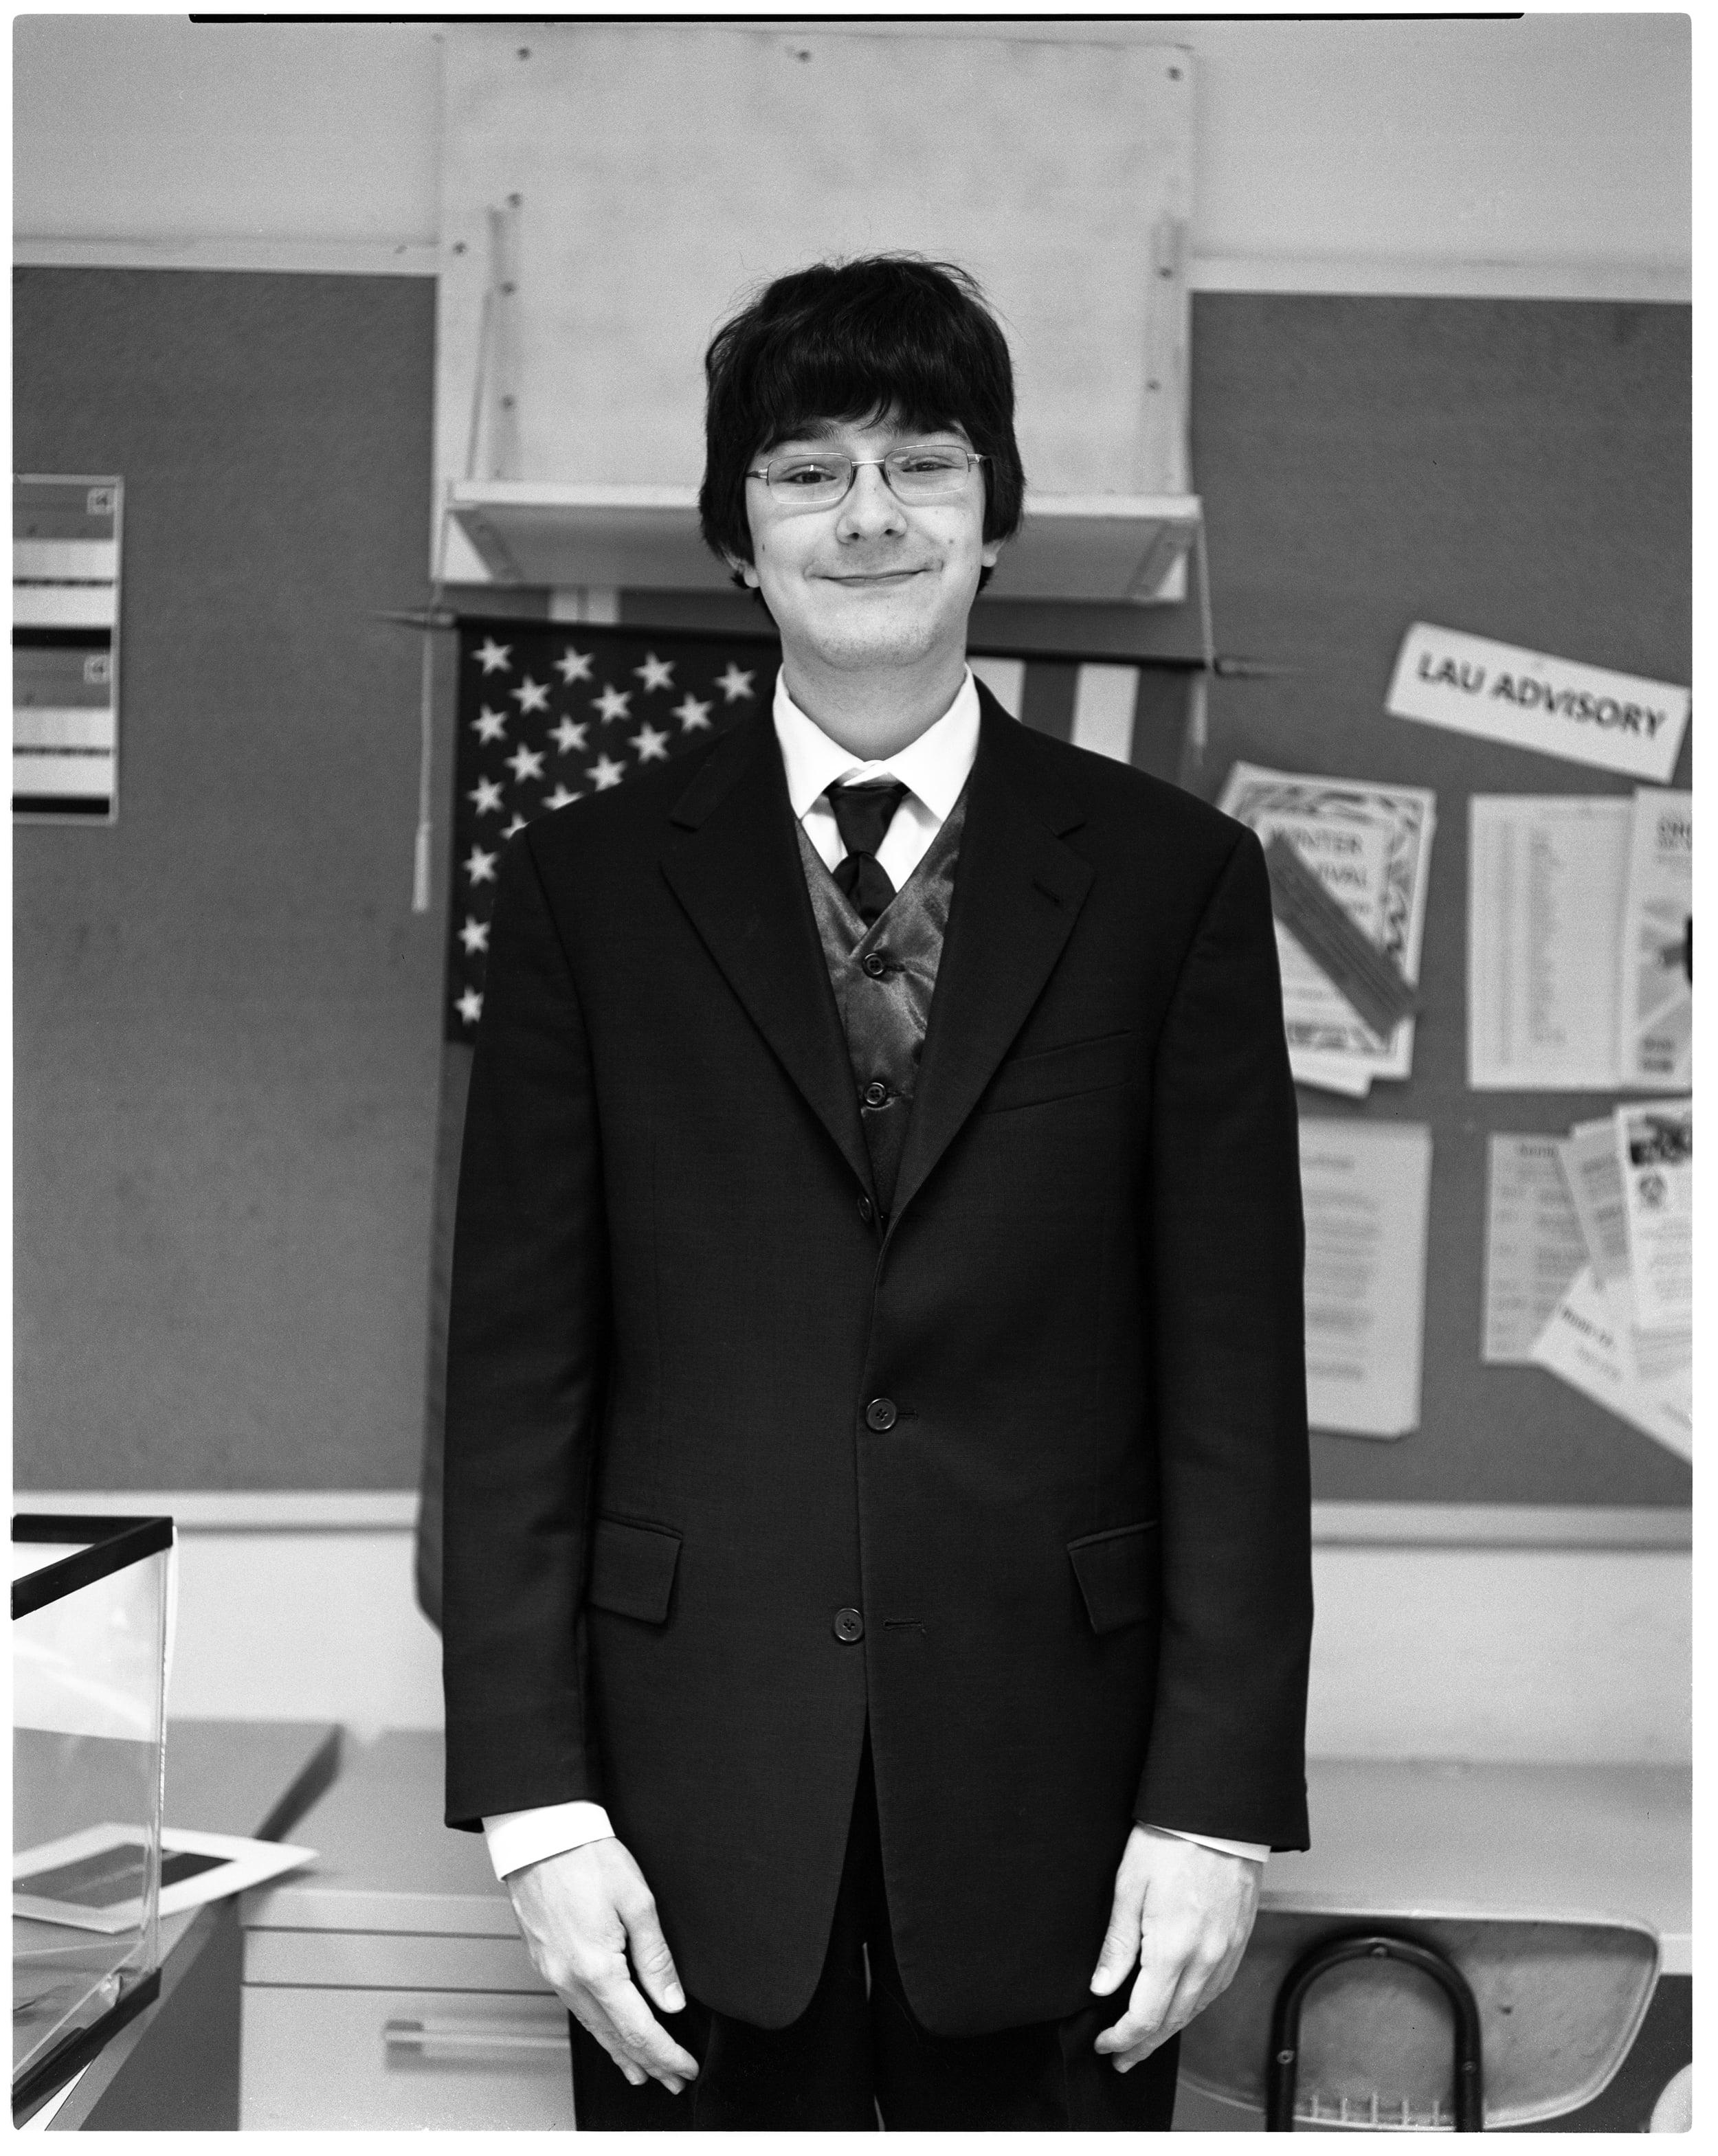 jack, class of 2015